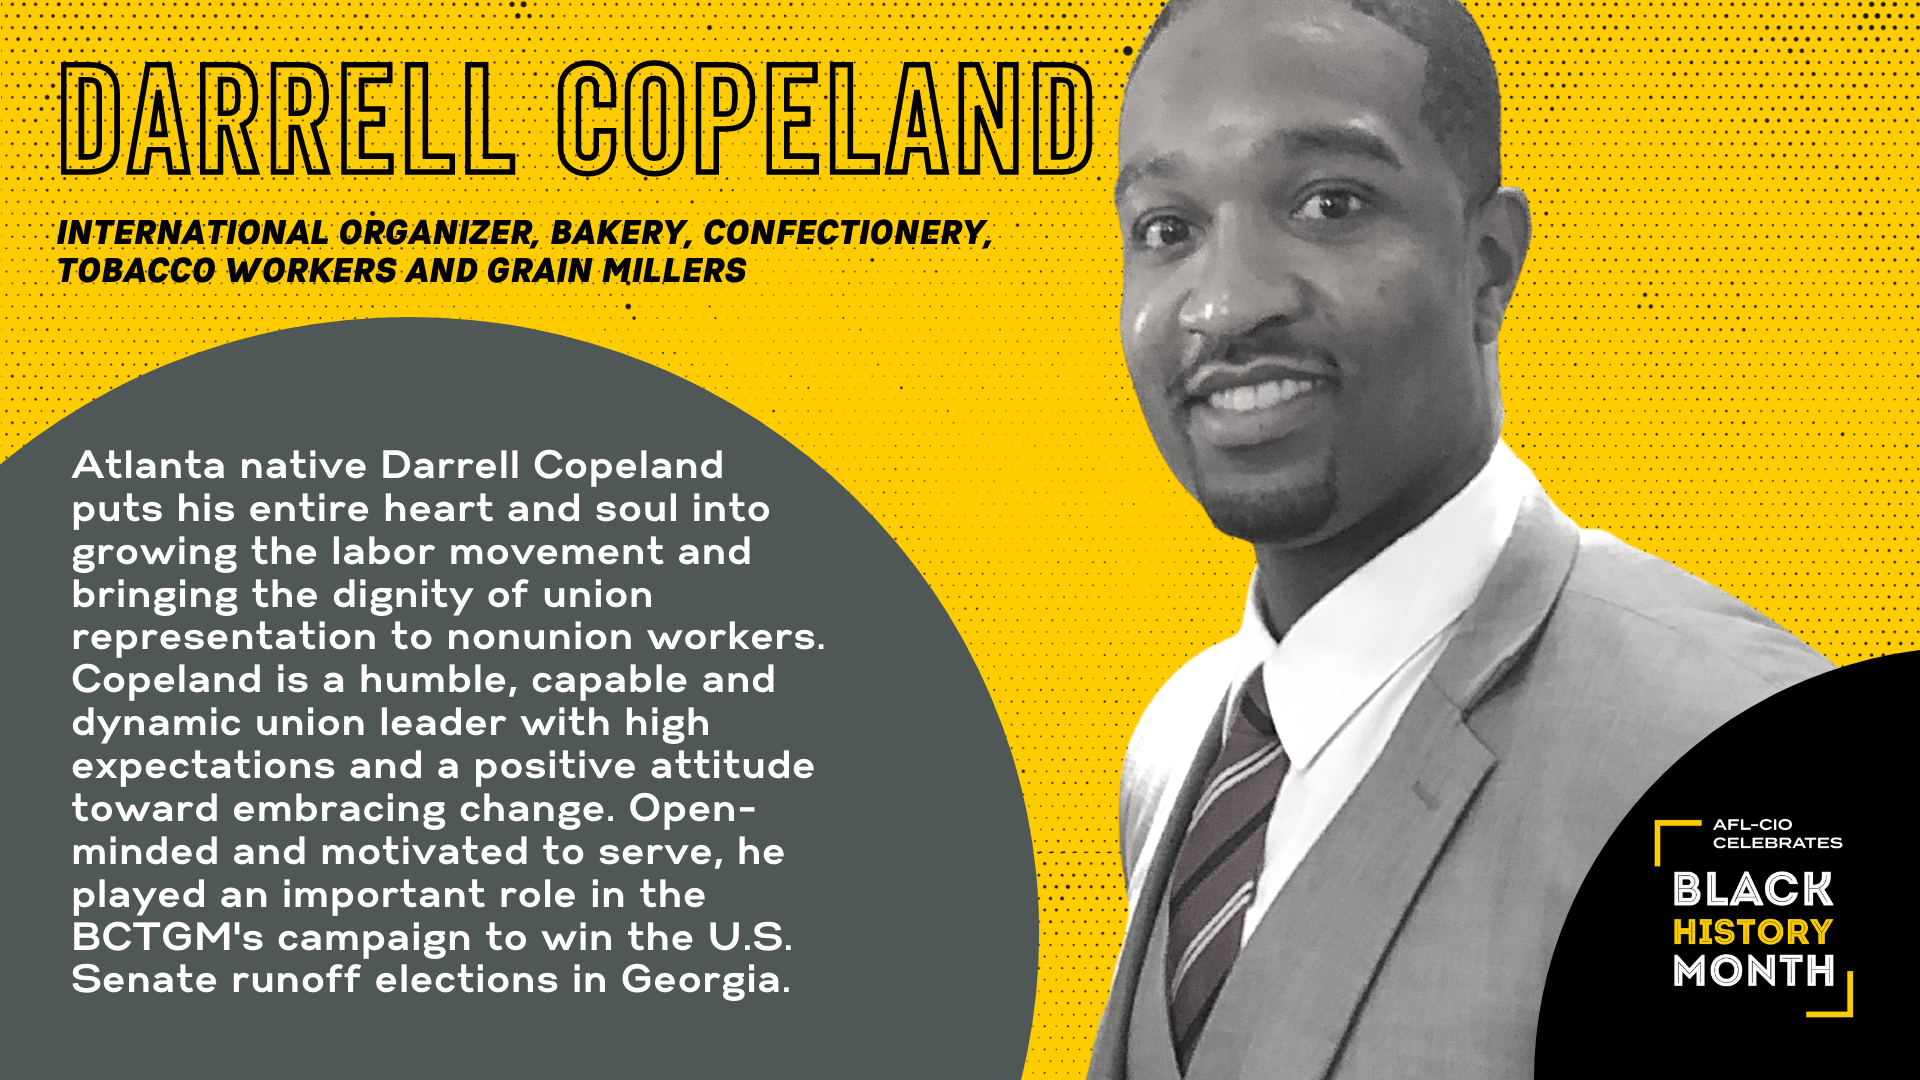 Darrell Copeland